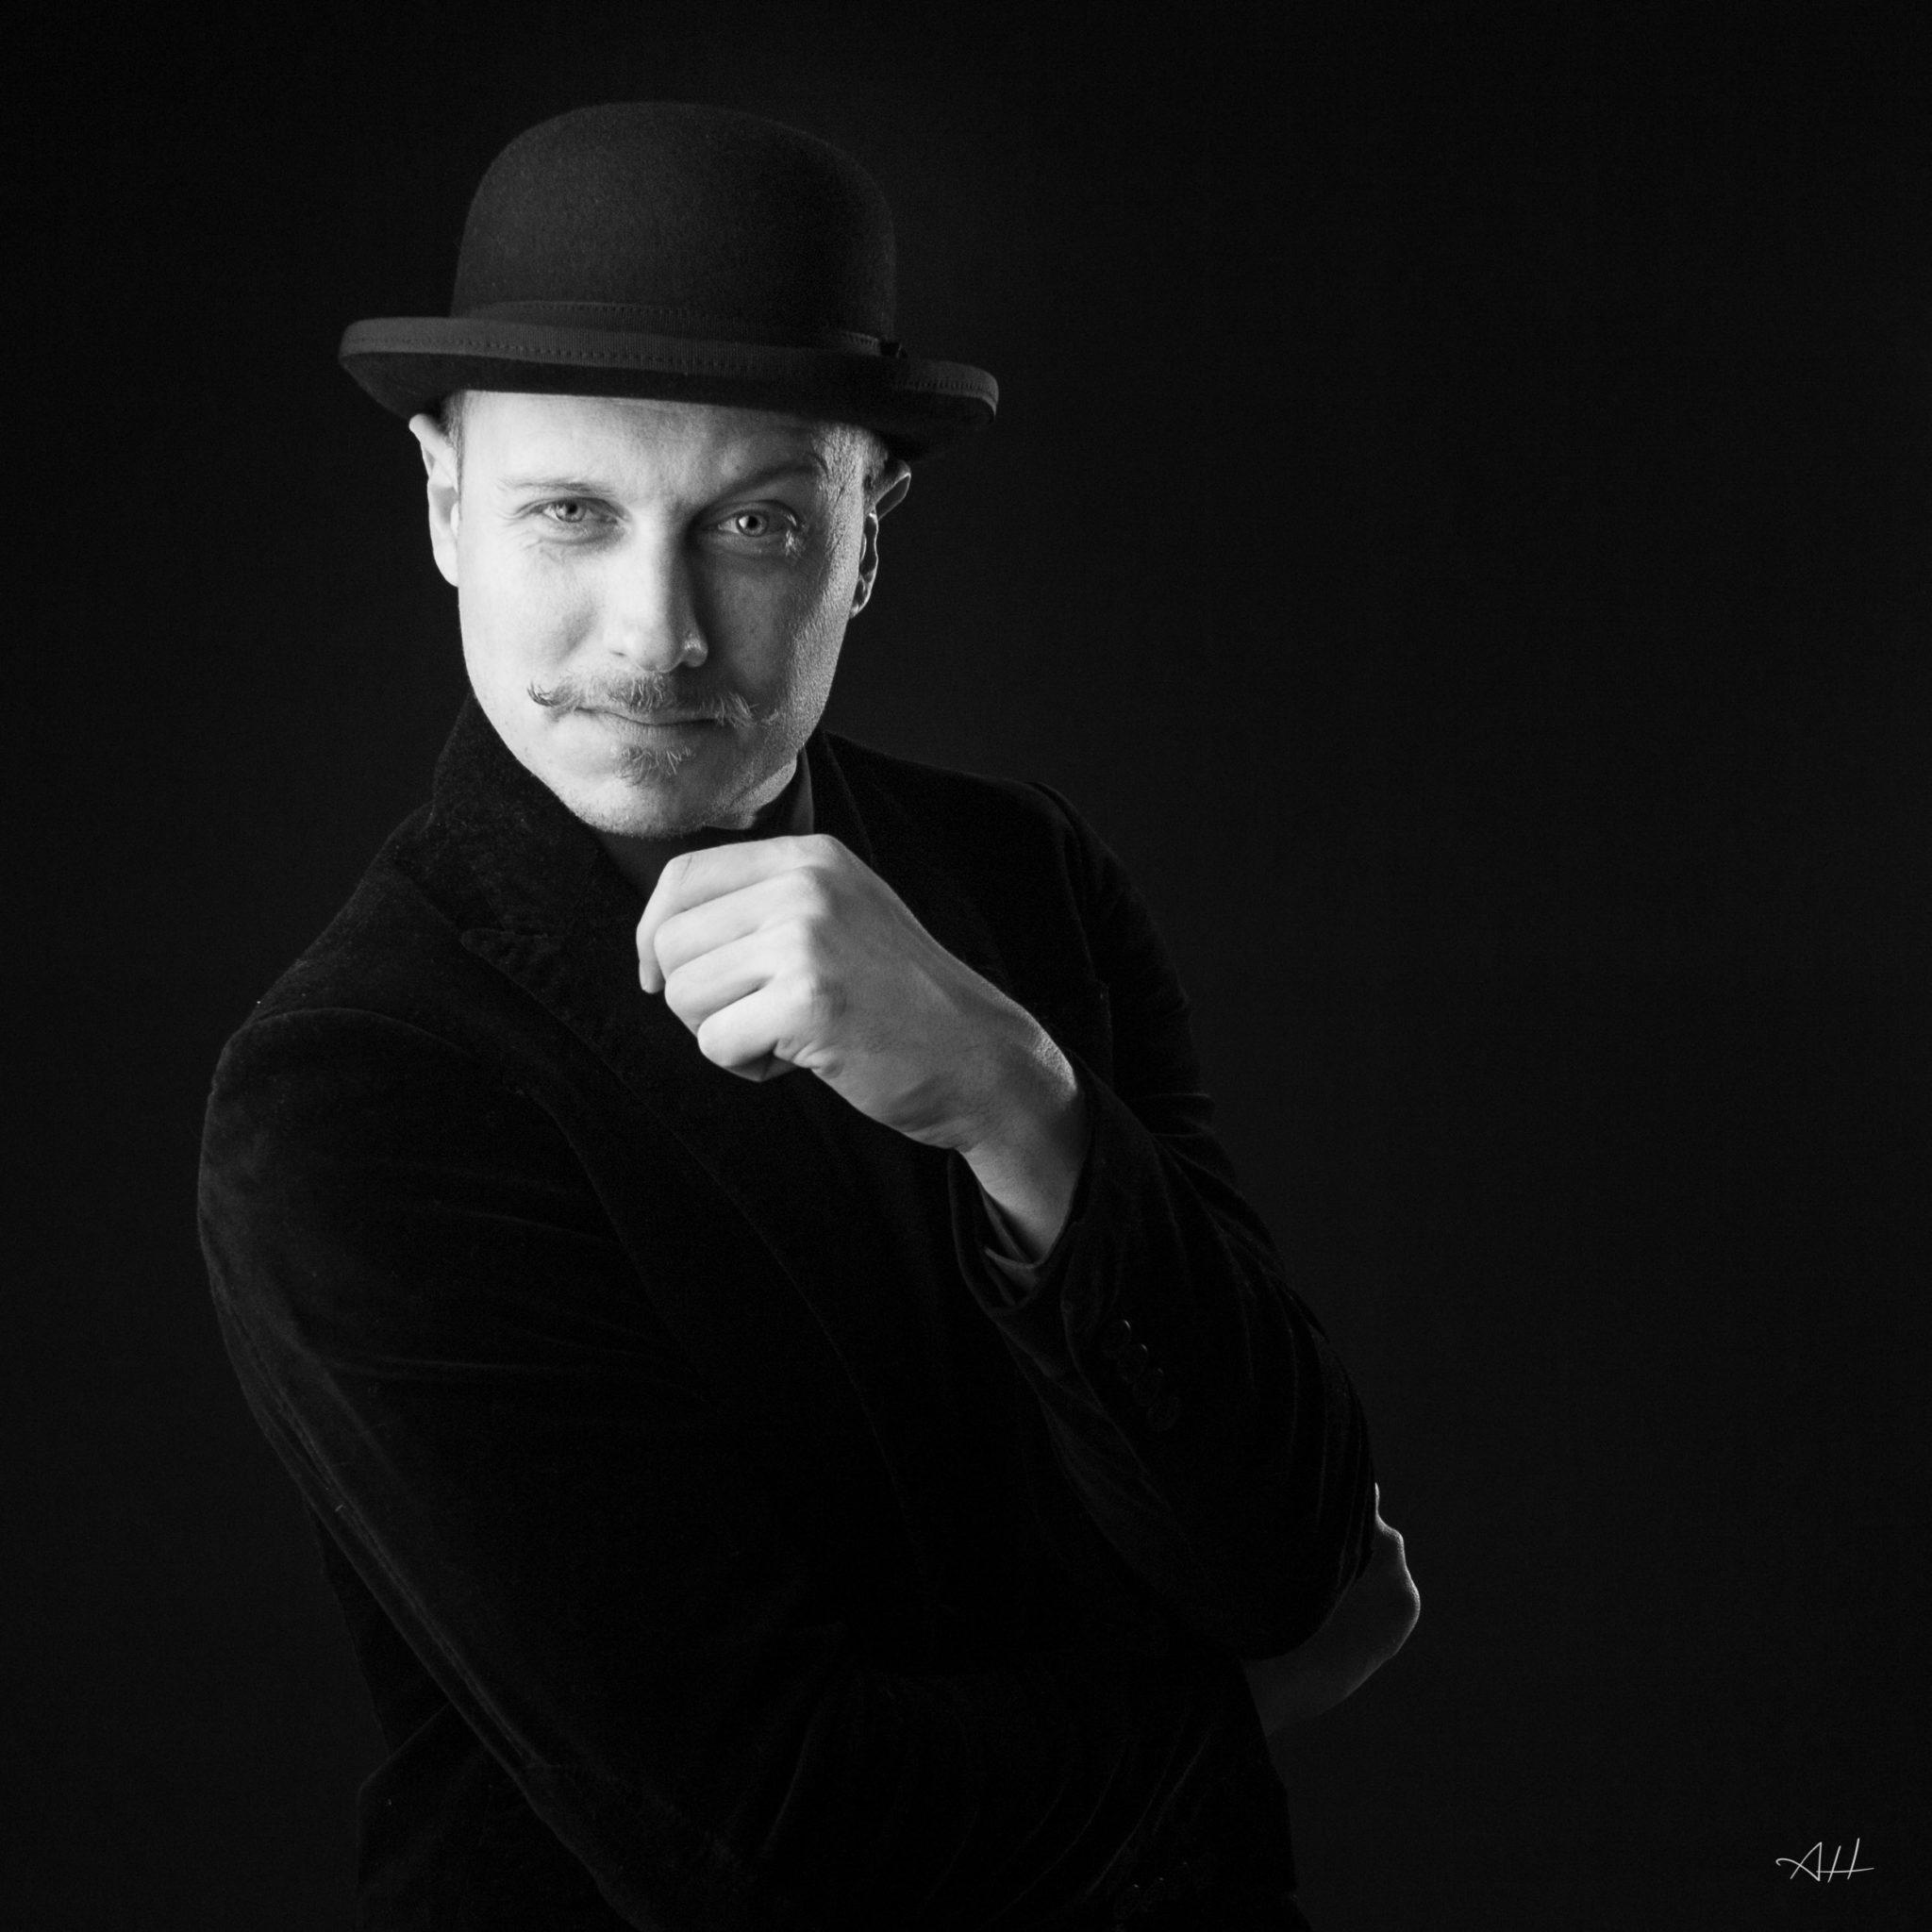 Antoine hermange Photographe, Un peu de moi